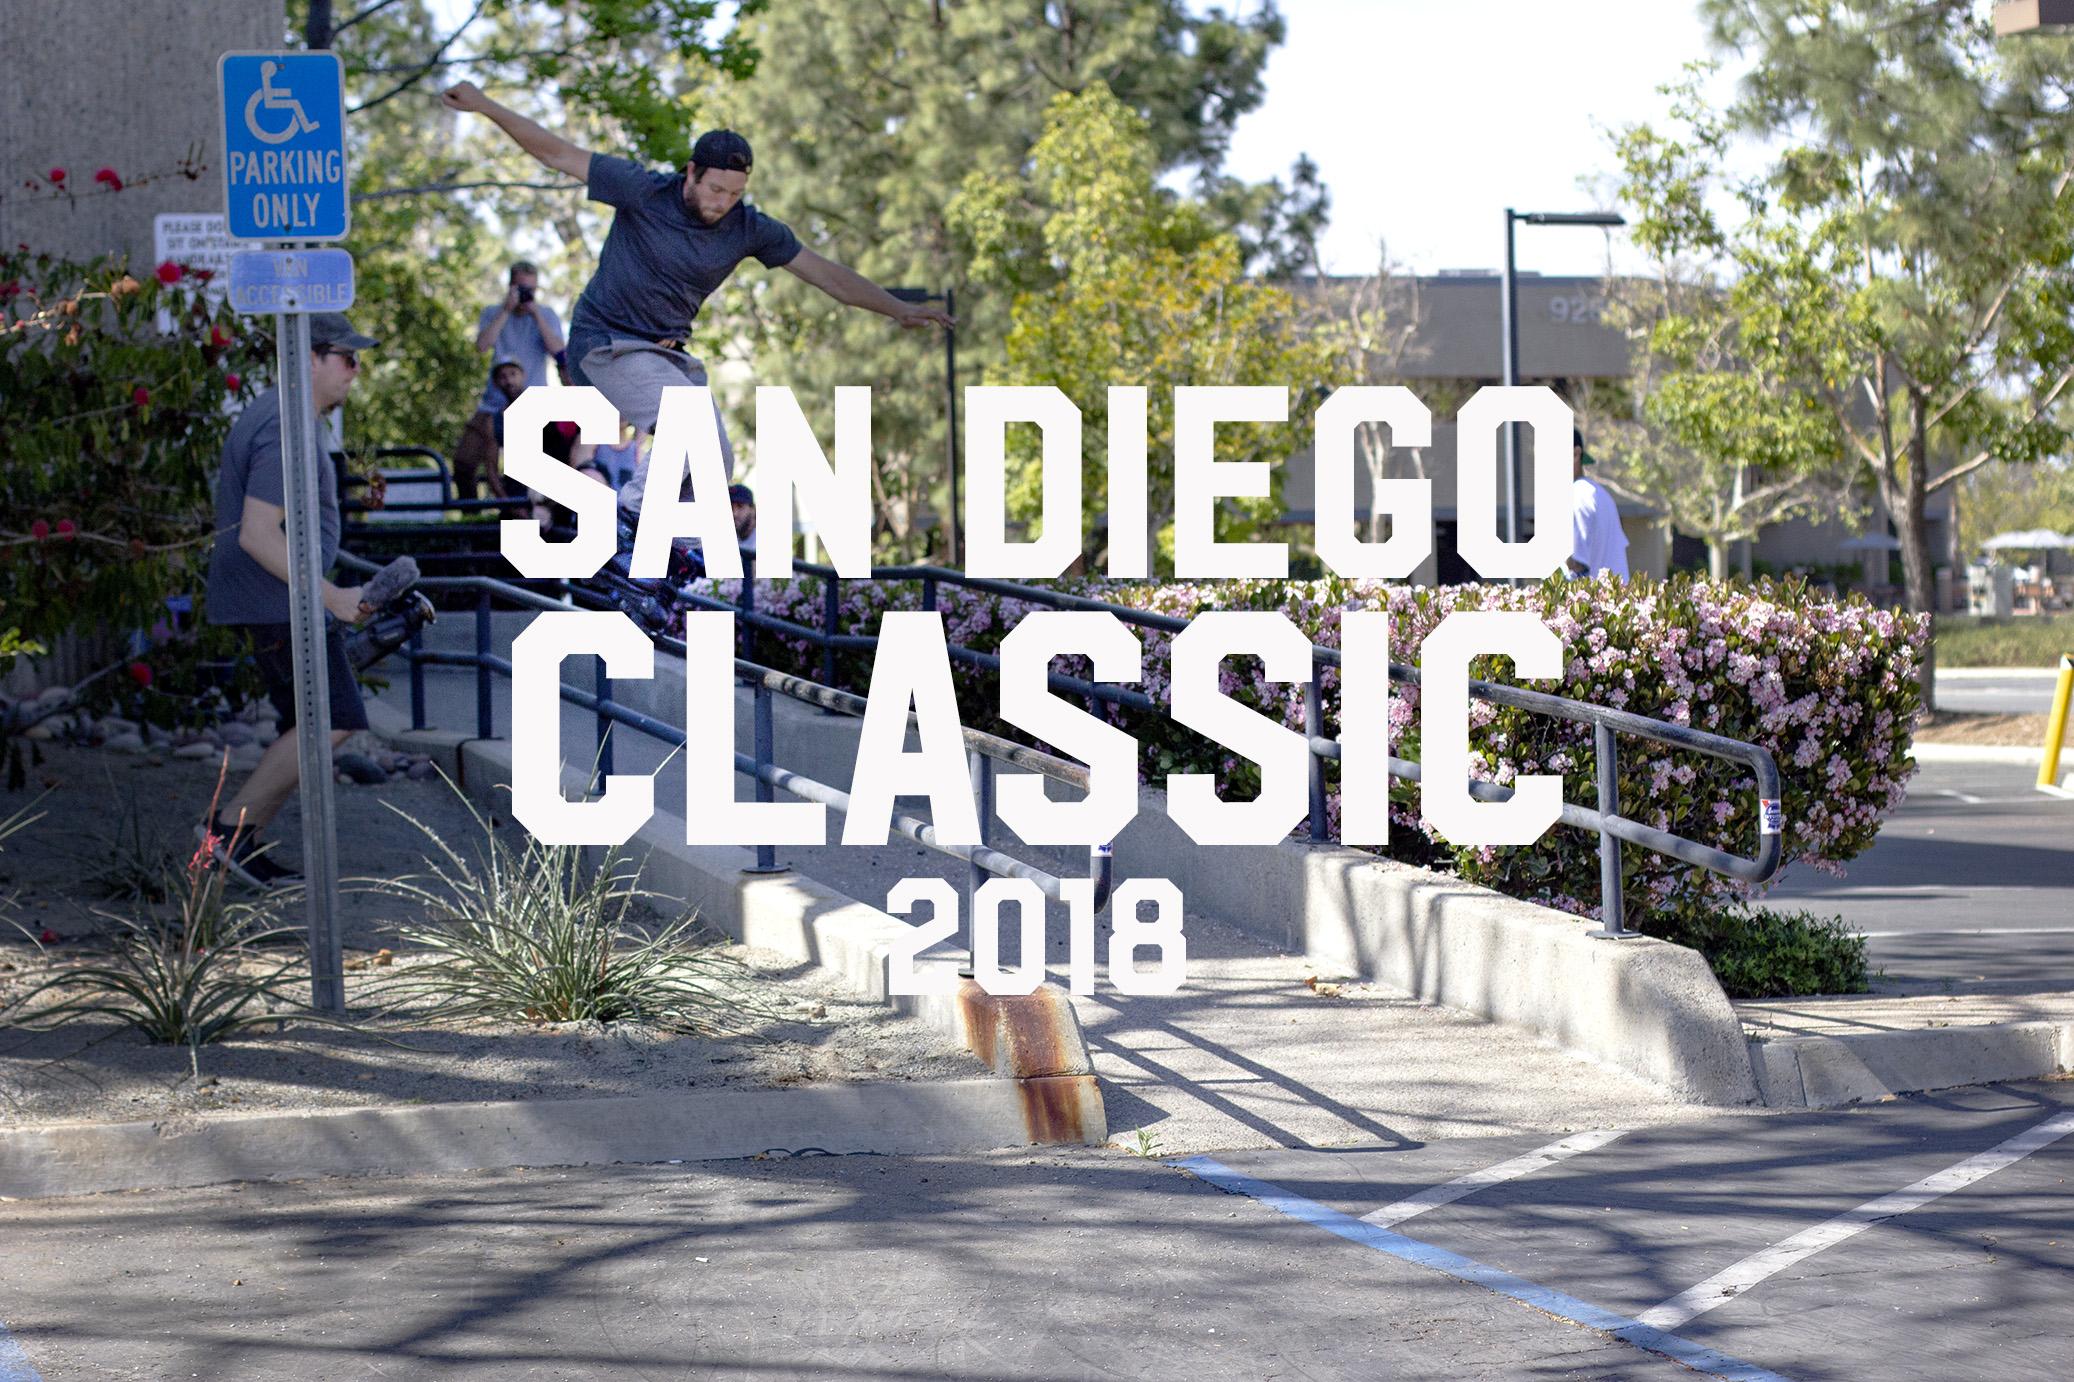 San Diego Classic 2018